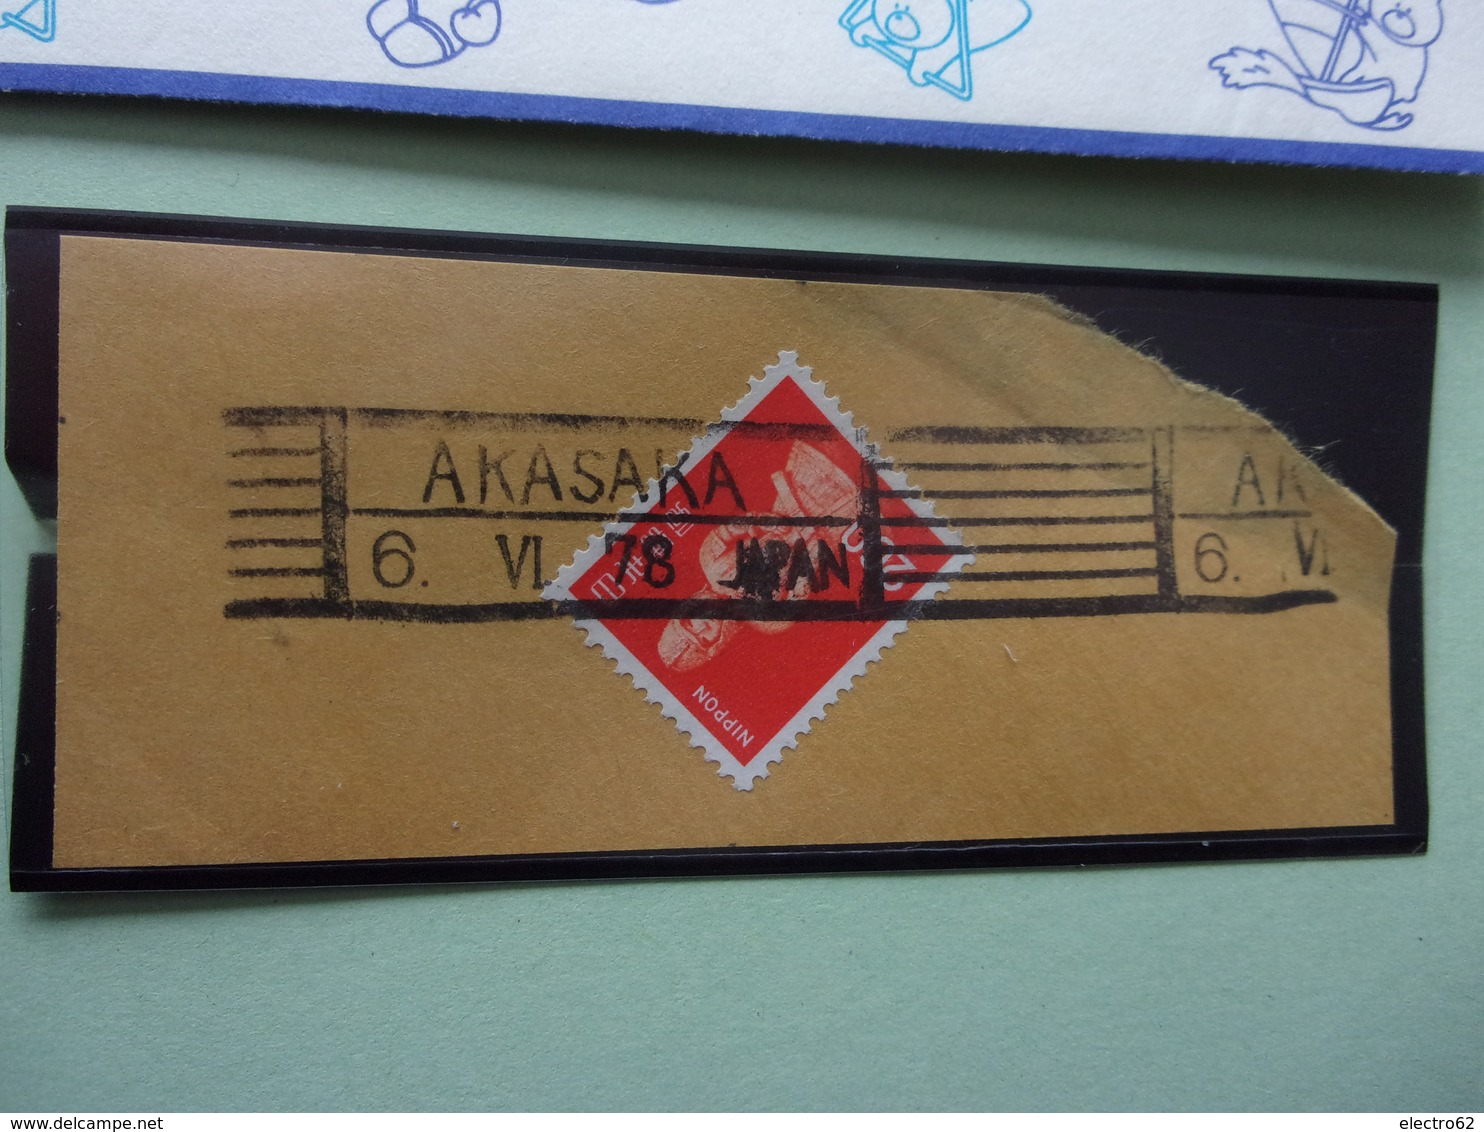 Japon Nippon Japan NANKAI COPORATION Toyo Industrial Co Osaka KAWASAKI BREMENDORI AKASAKA HIGASHINADA - Japon